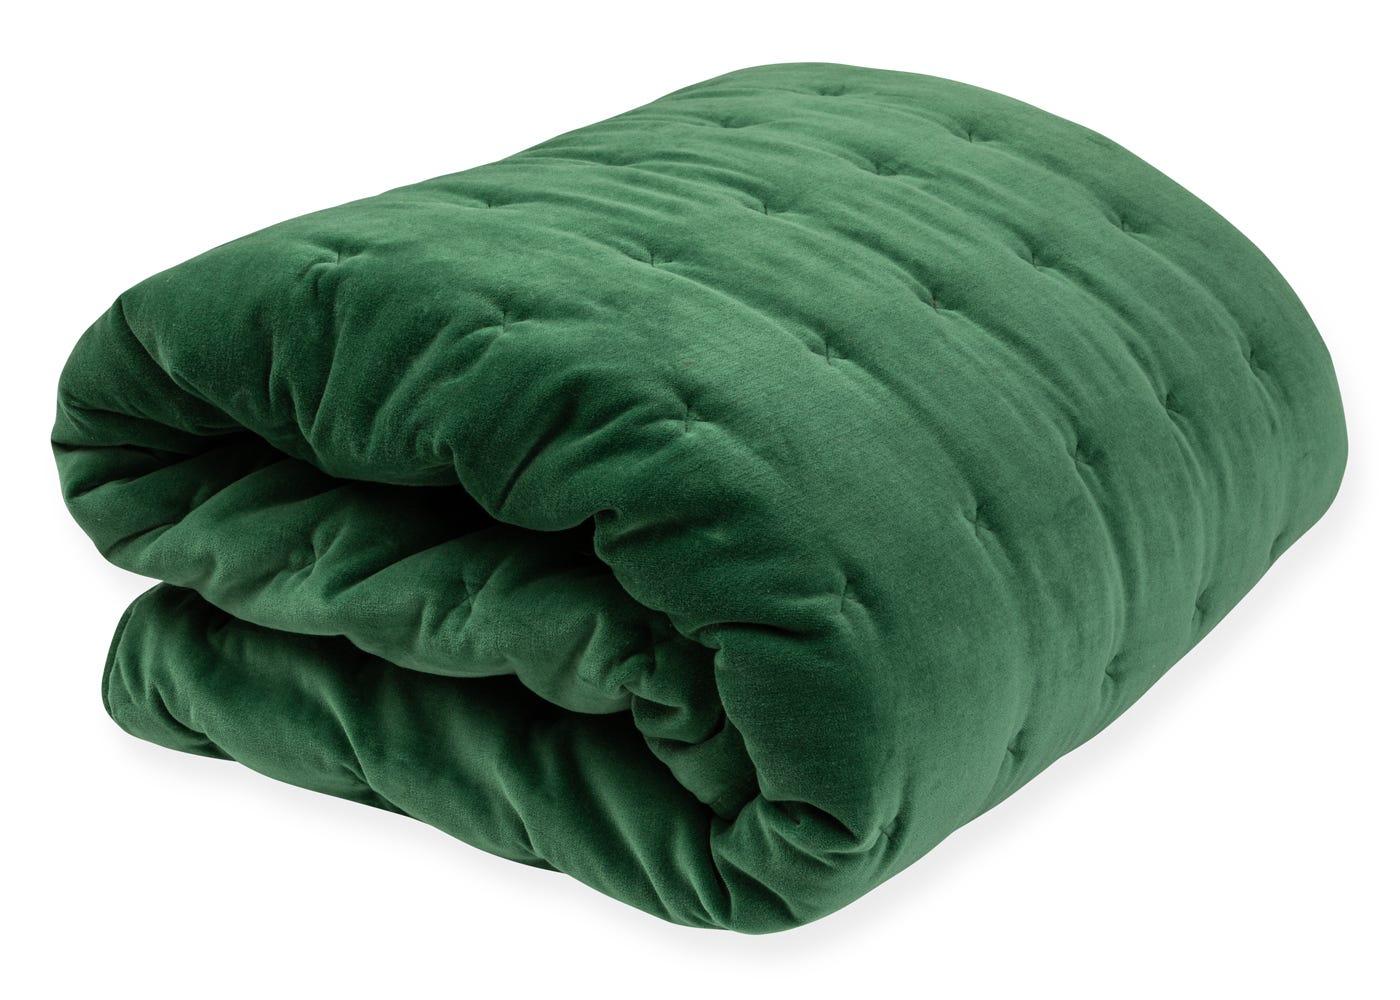 Heal's Velvet Quilt Emerald Green 240 x 260cm